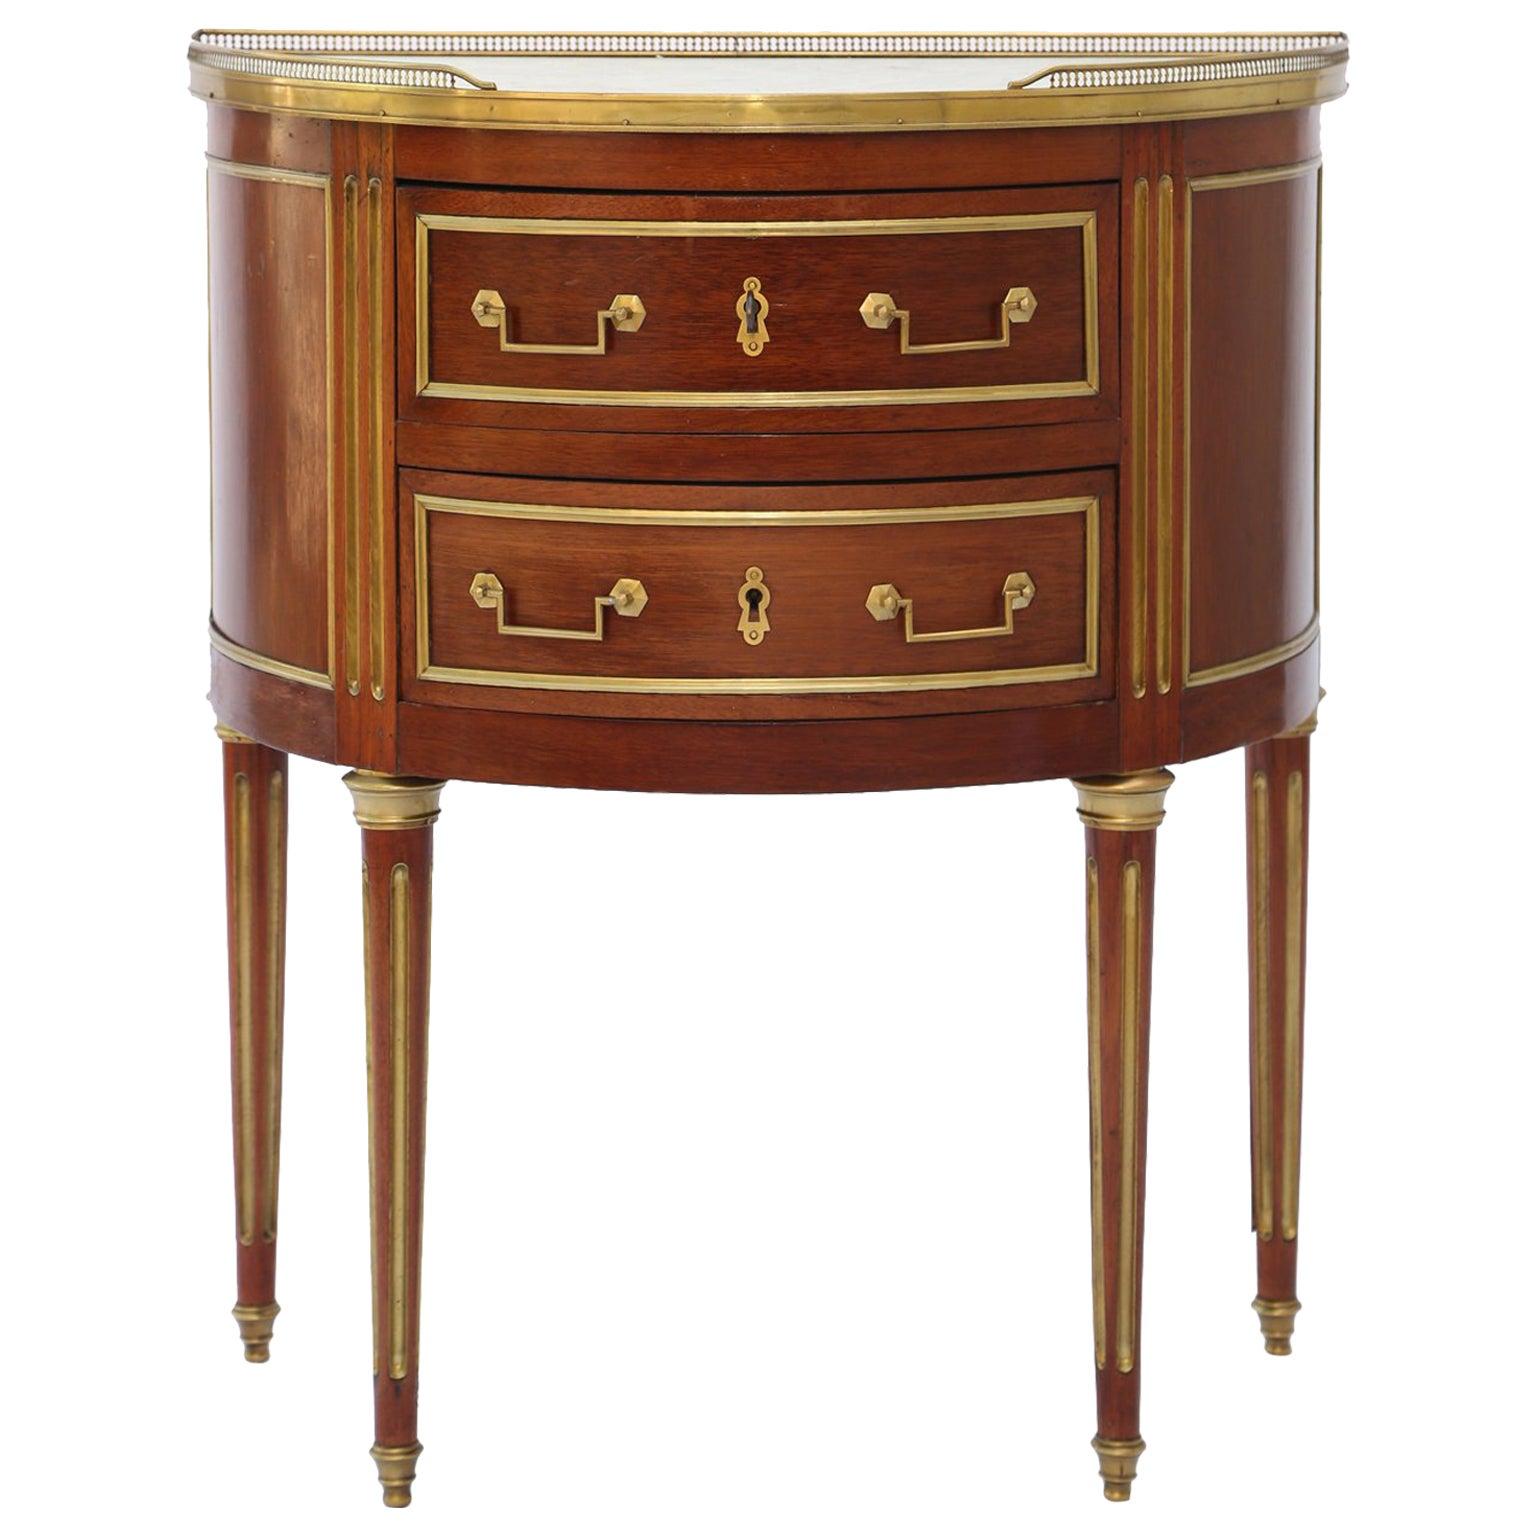 19th Century Louis XVI Style Mahogany Demilune Commode